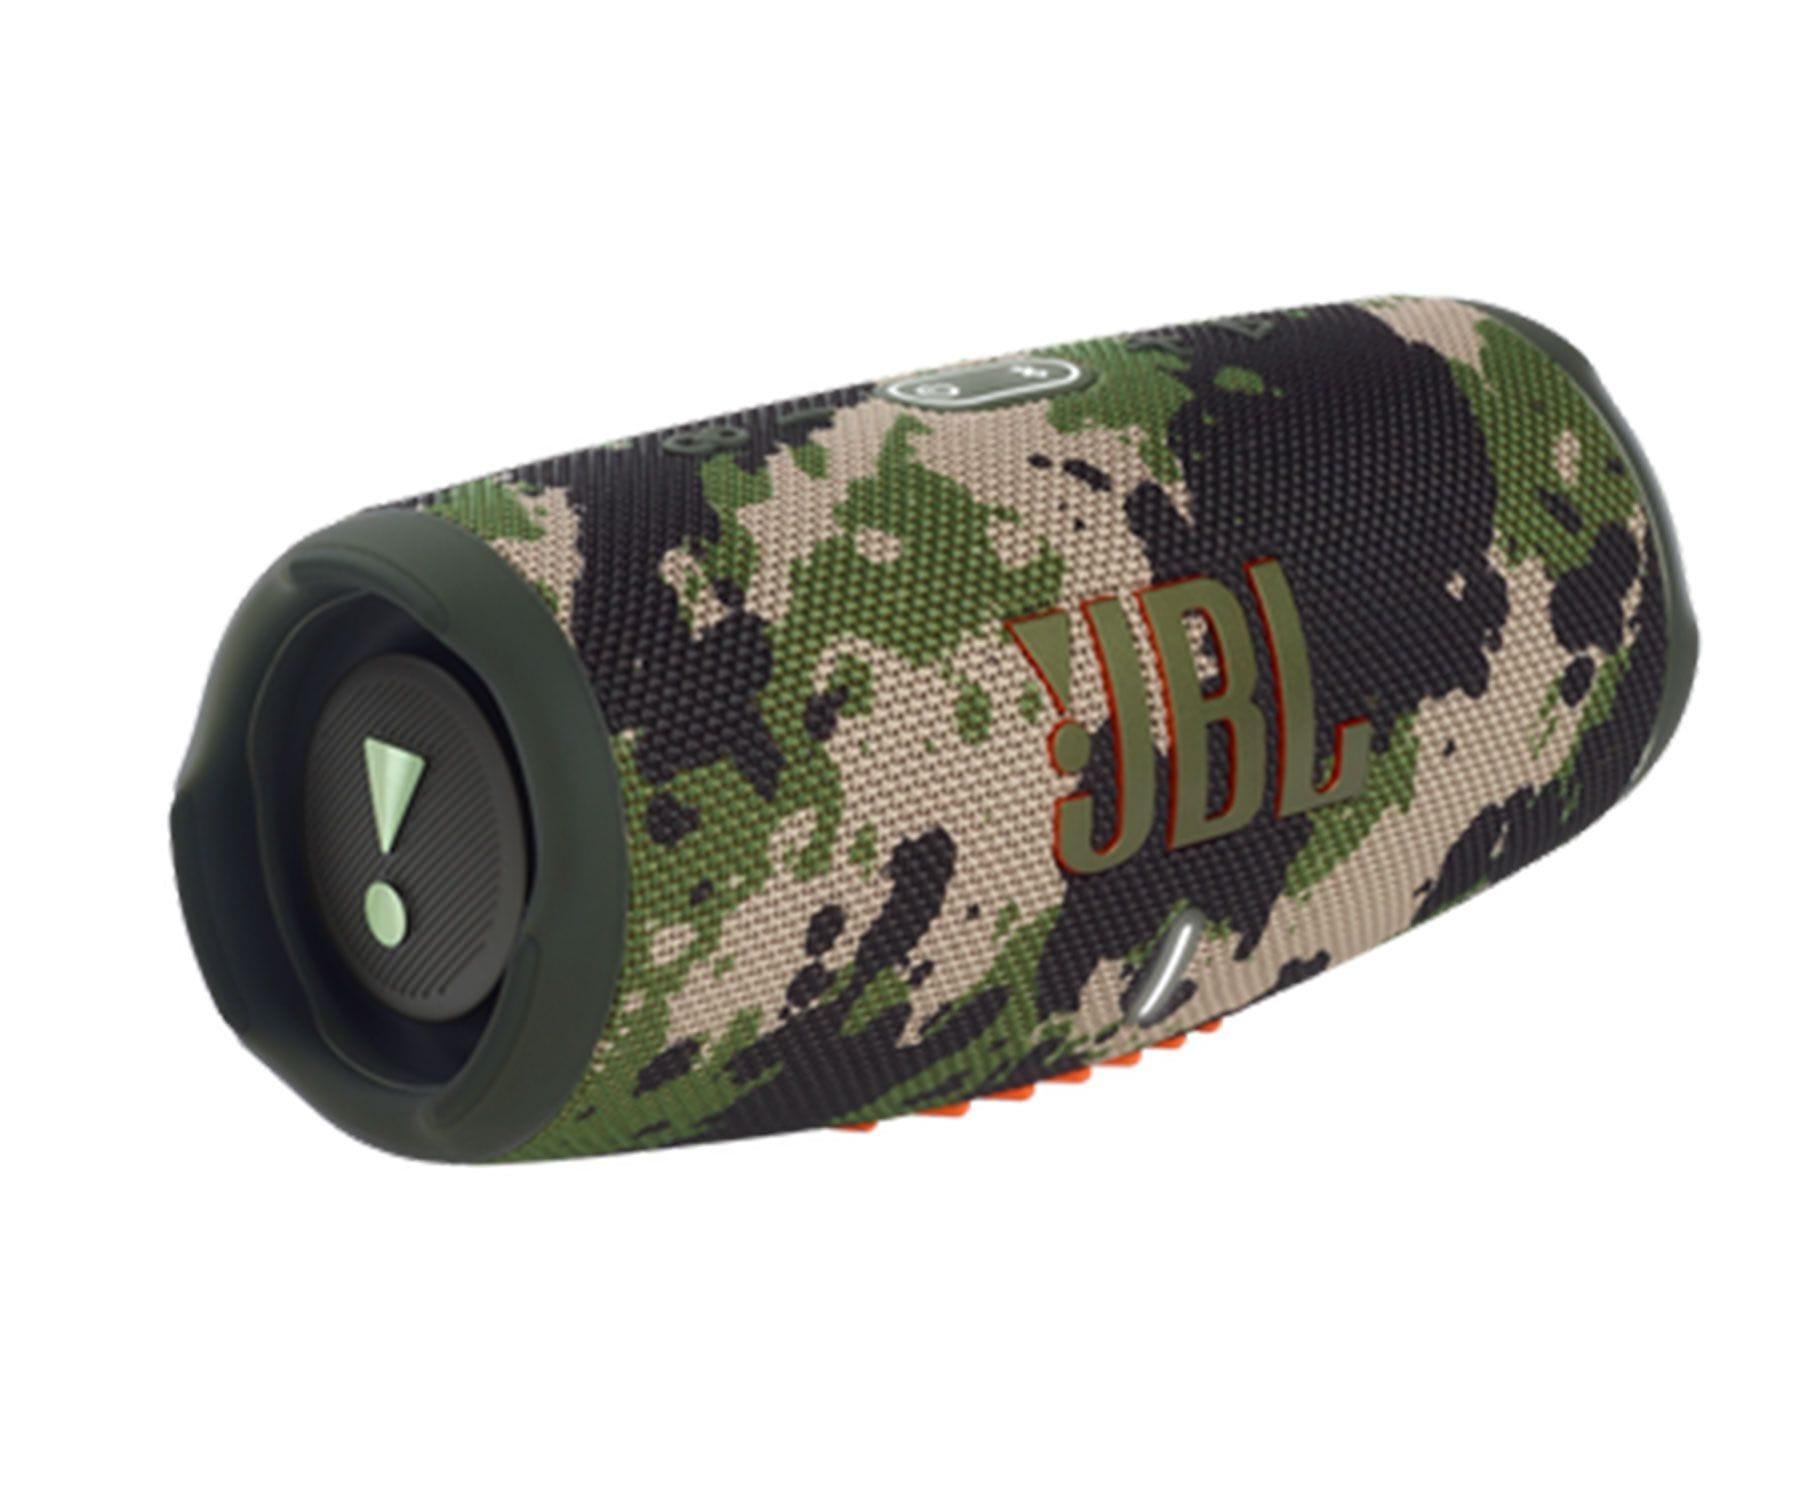 Jbl Altavoz Charge5 Squad/Bluetooth/IP67/Partyboost